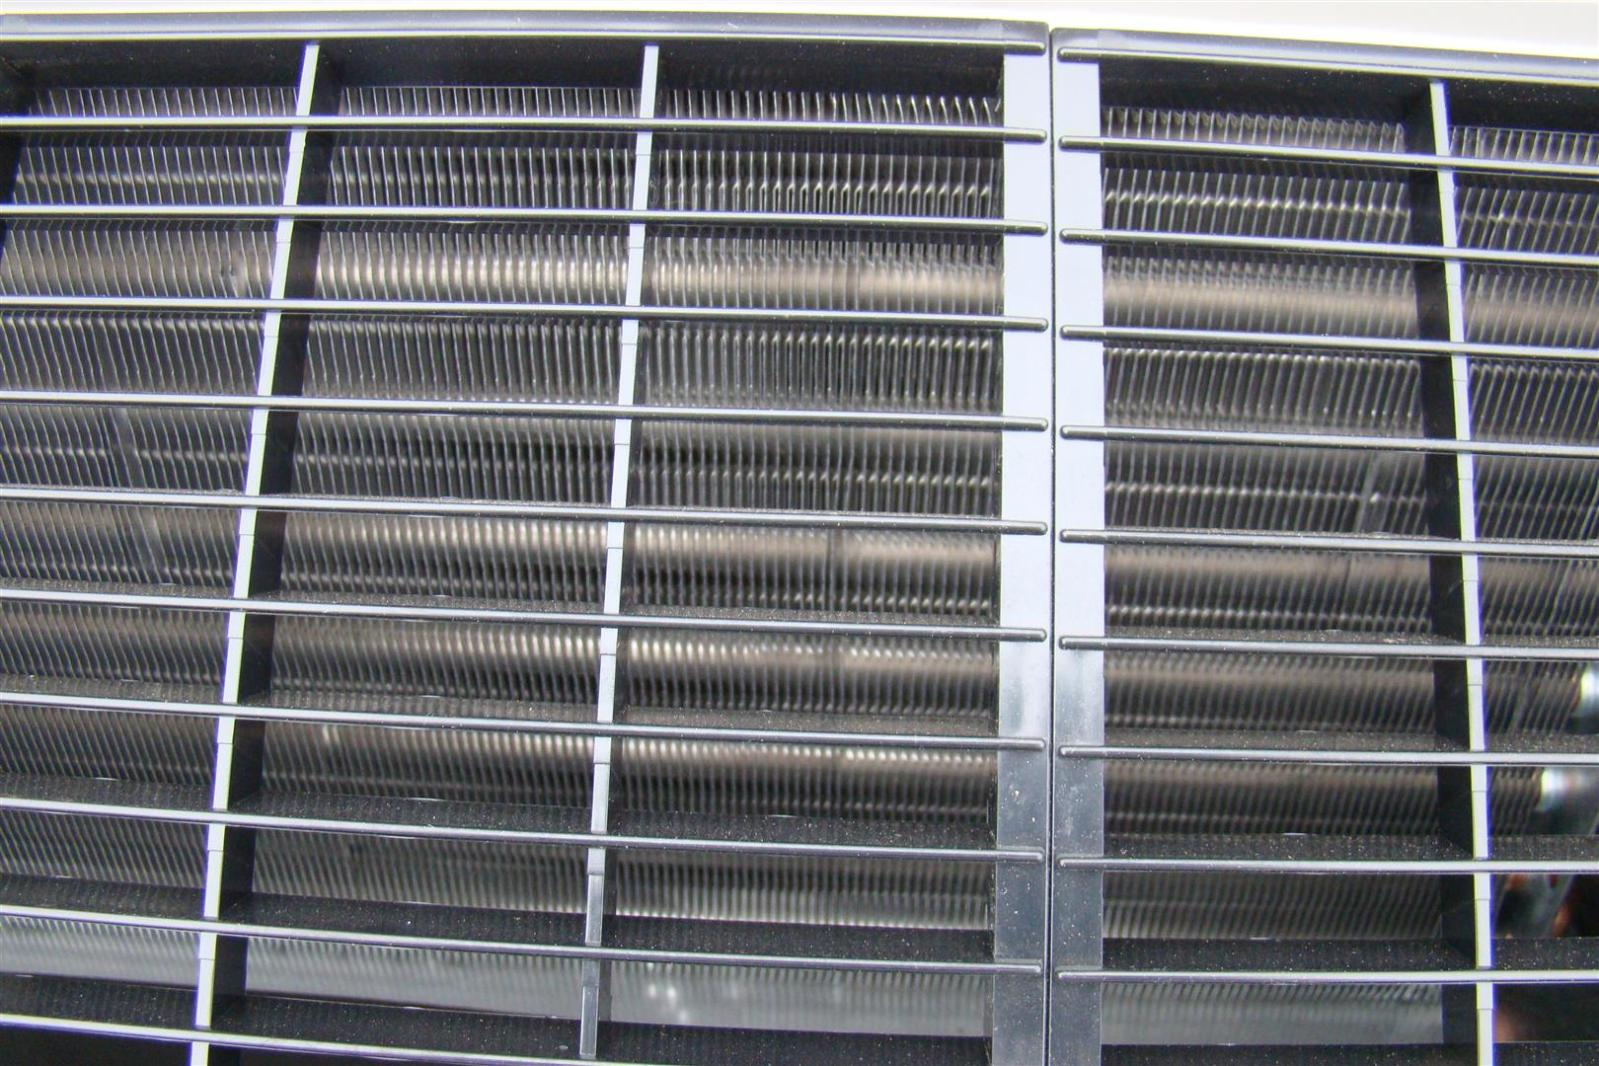 Details about Trane Heat Pump Air Conditioner Vertical Cabinet Size 04  #535478